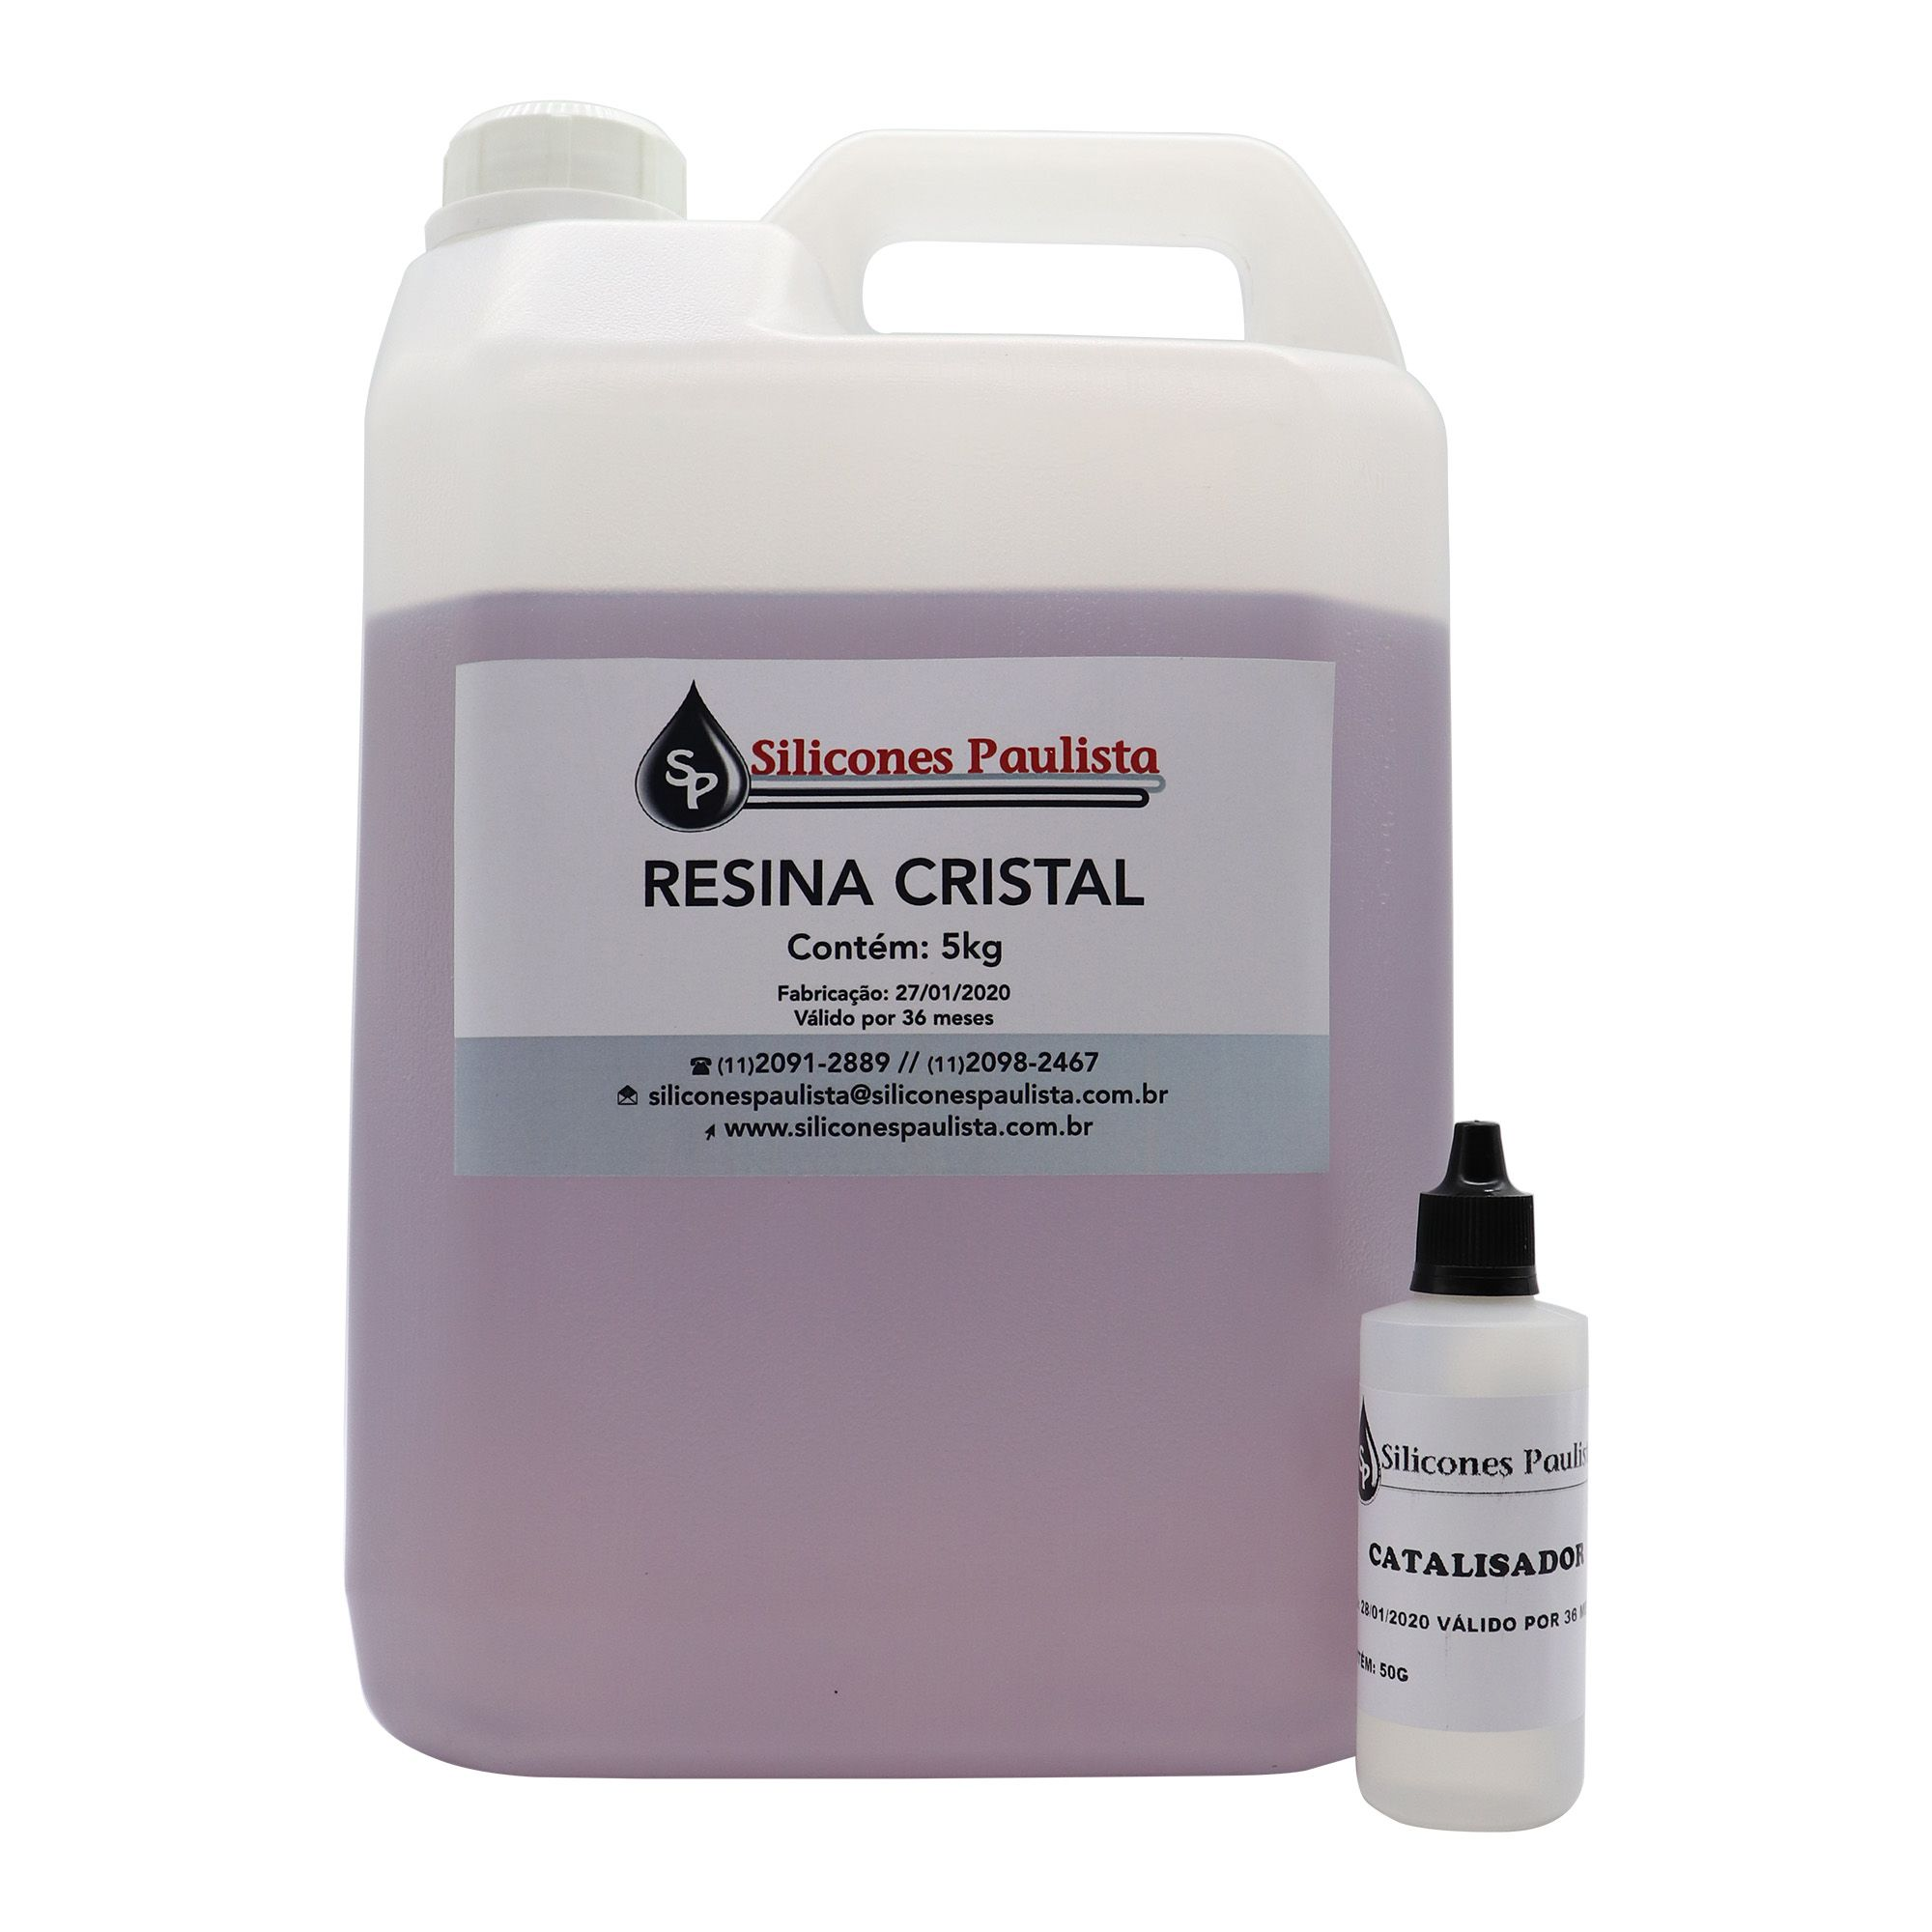 Resina Cristal (Resina 5Kg / Catalizador 50g)